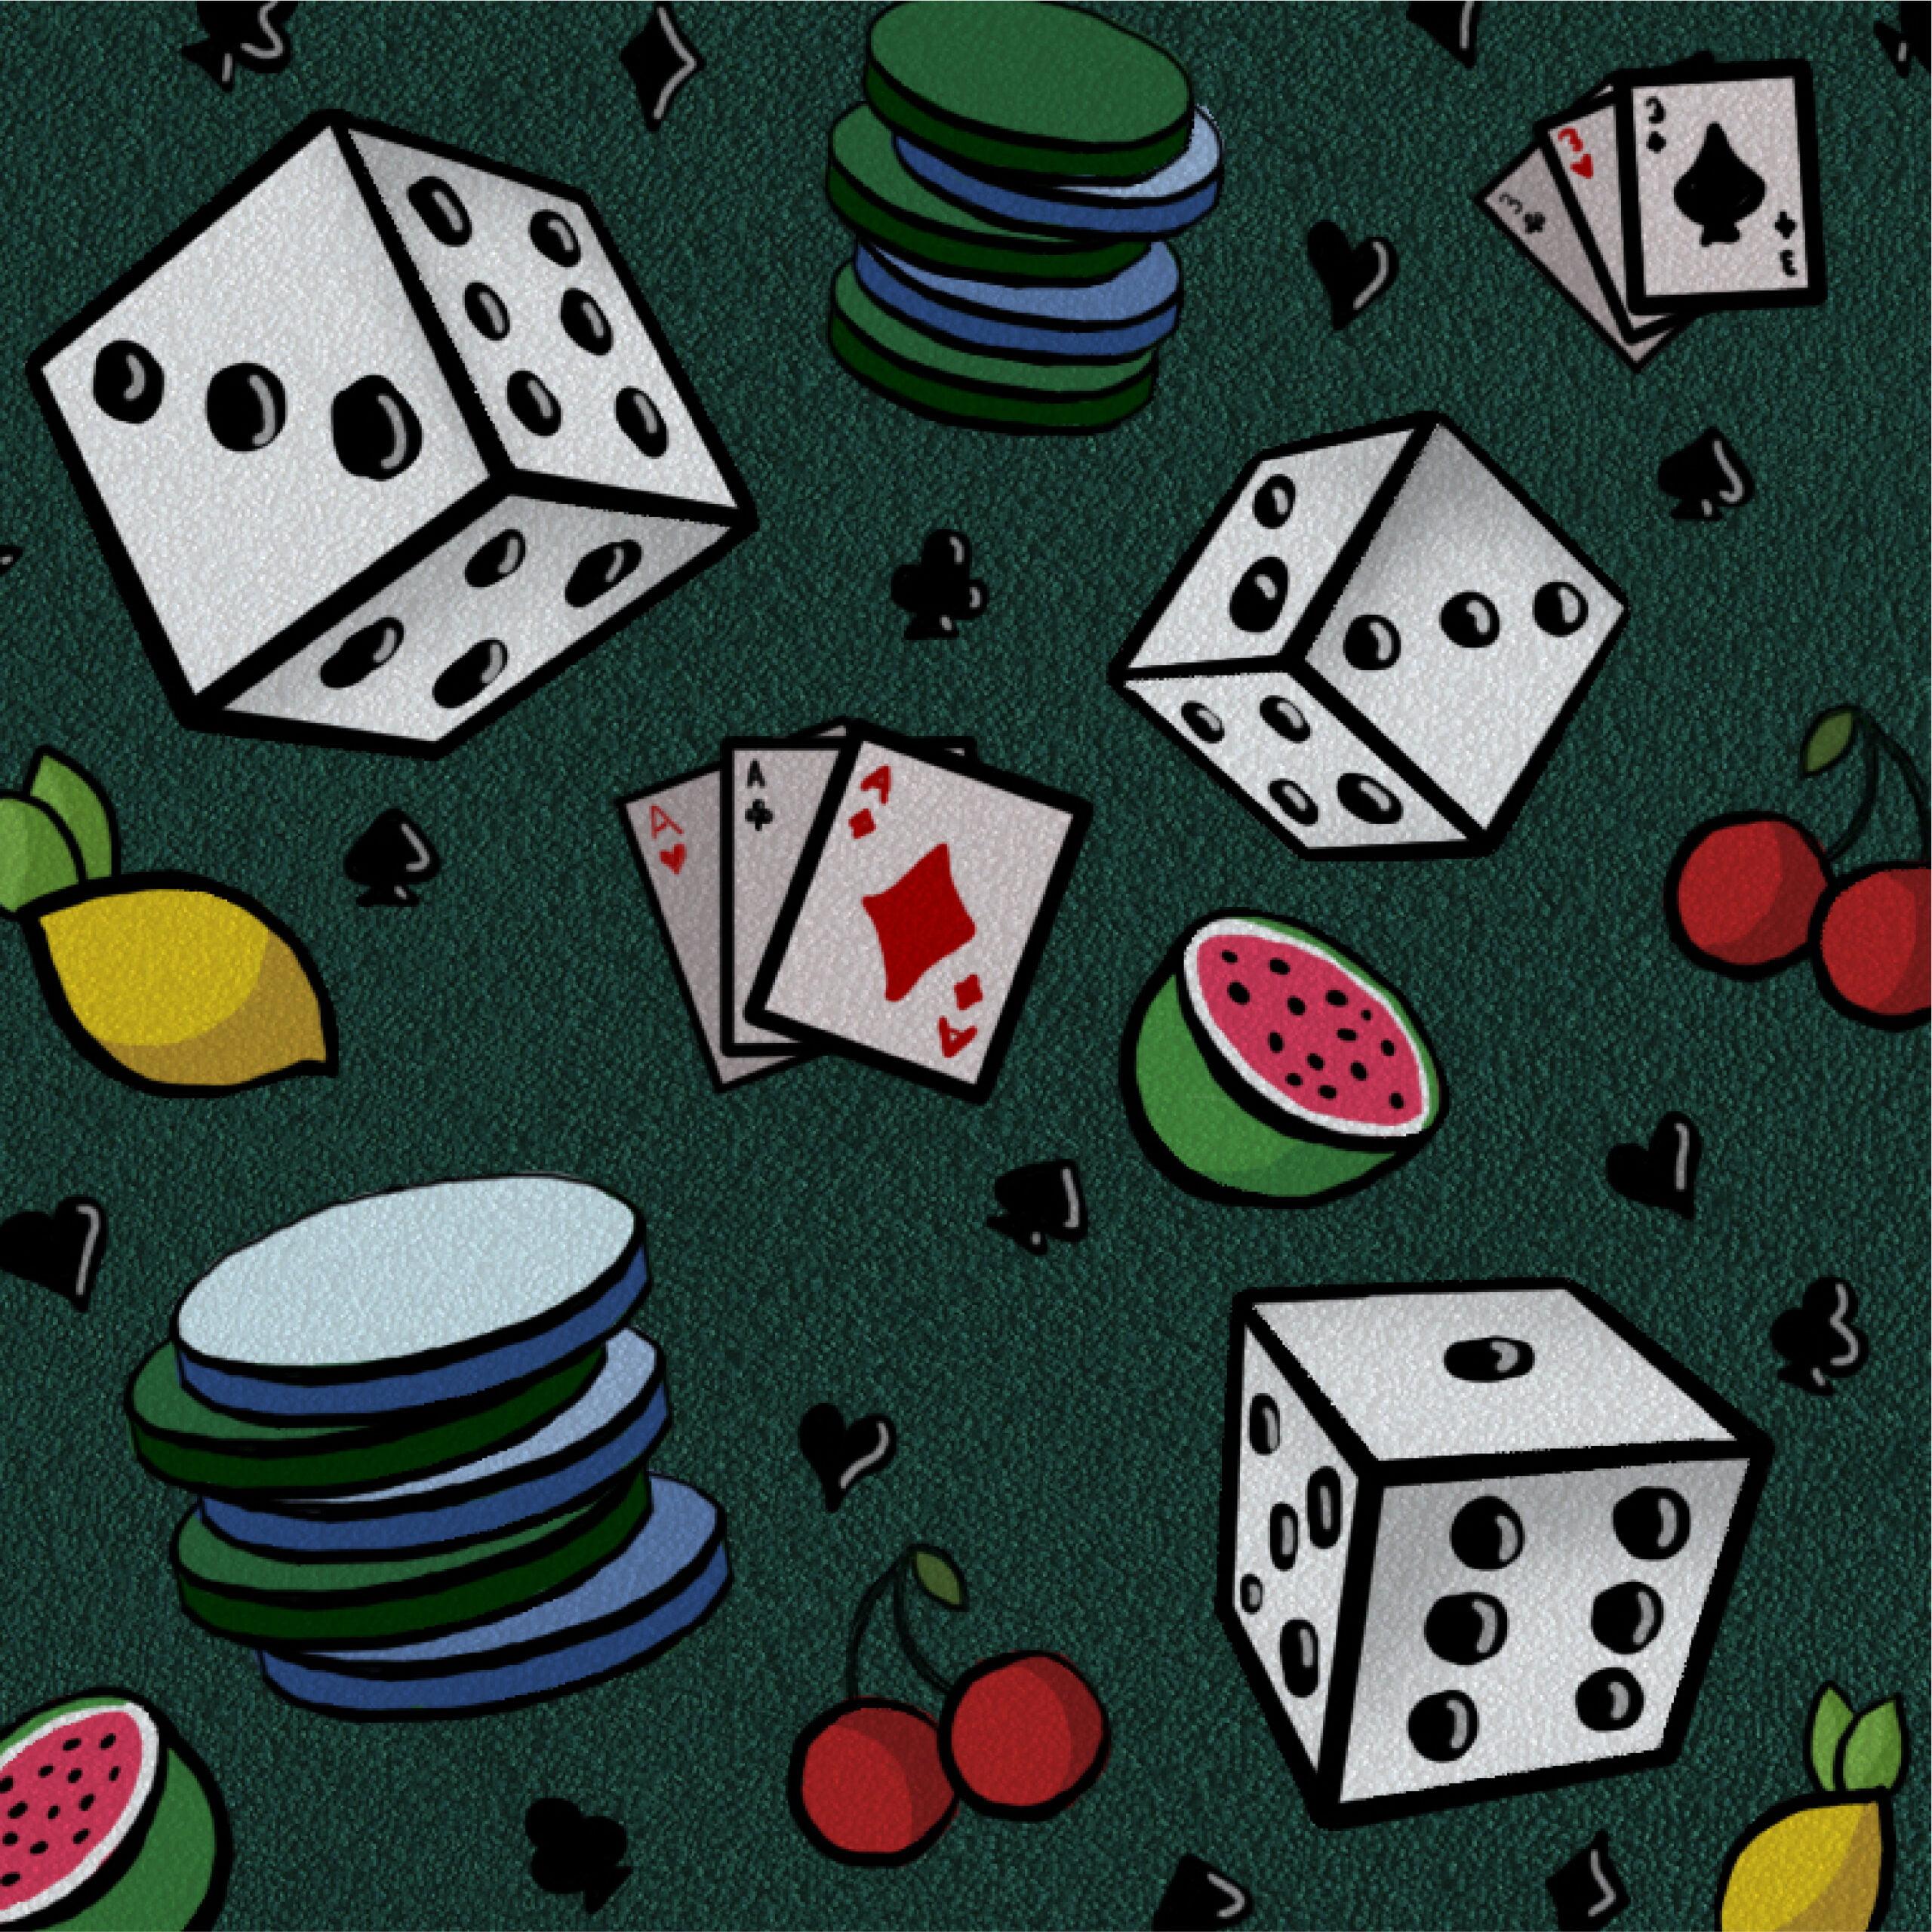 Alex Bogdan illustration for 360 MAGAZINE casino and gaming article